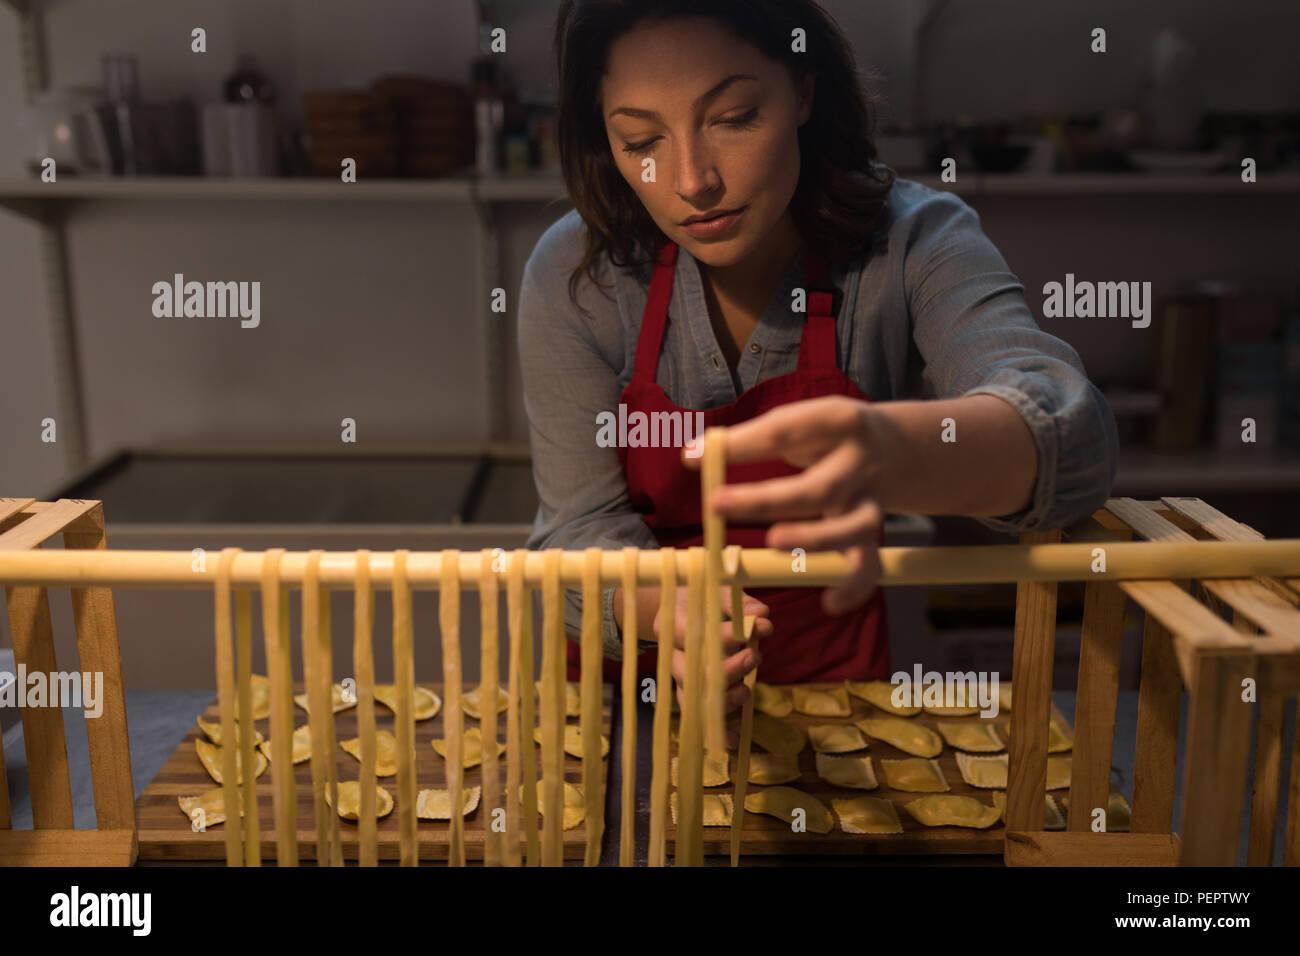 Female baker preparing pasta in bakery - Stock Image